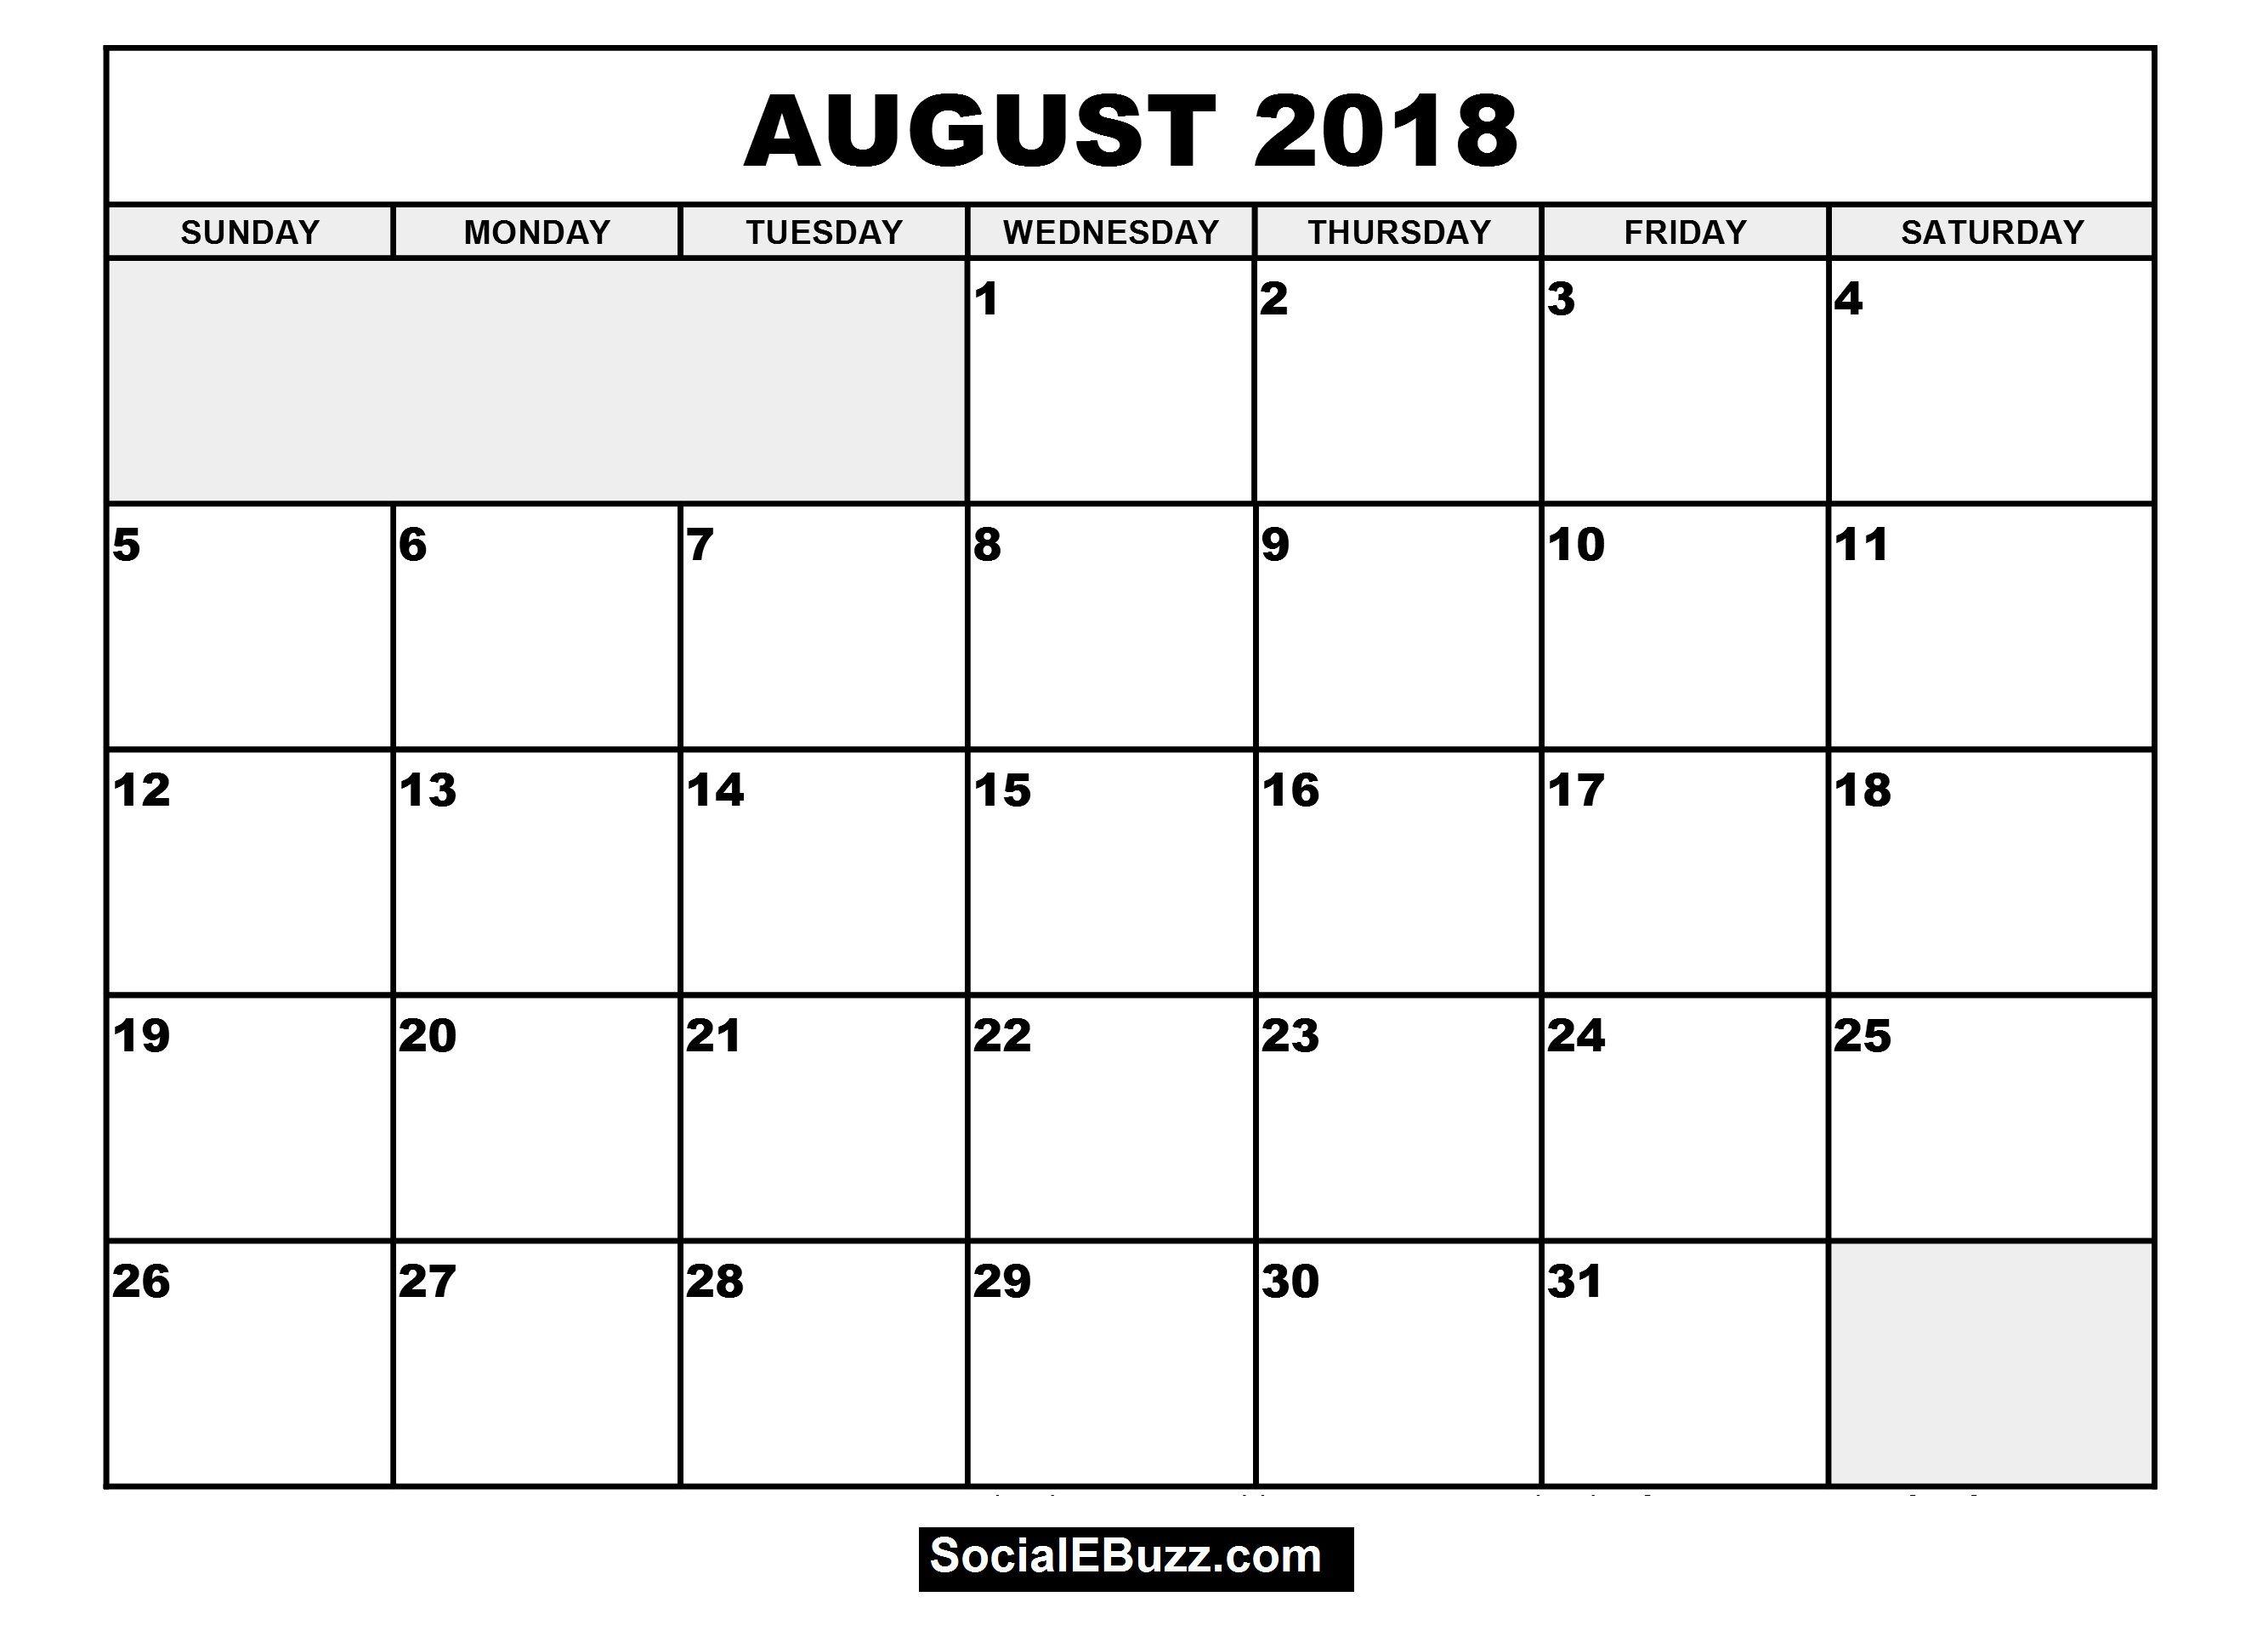 August 2018 Calendar Printable Template | August 2018 Calendar Blank for Blank Calendar Printable August